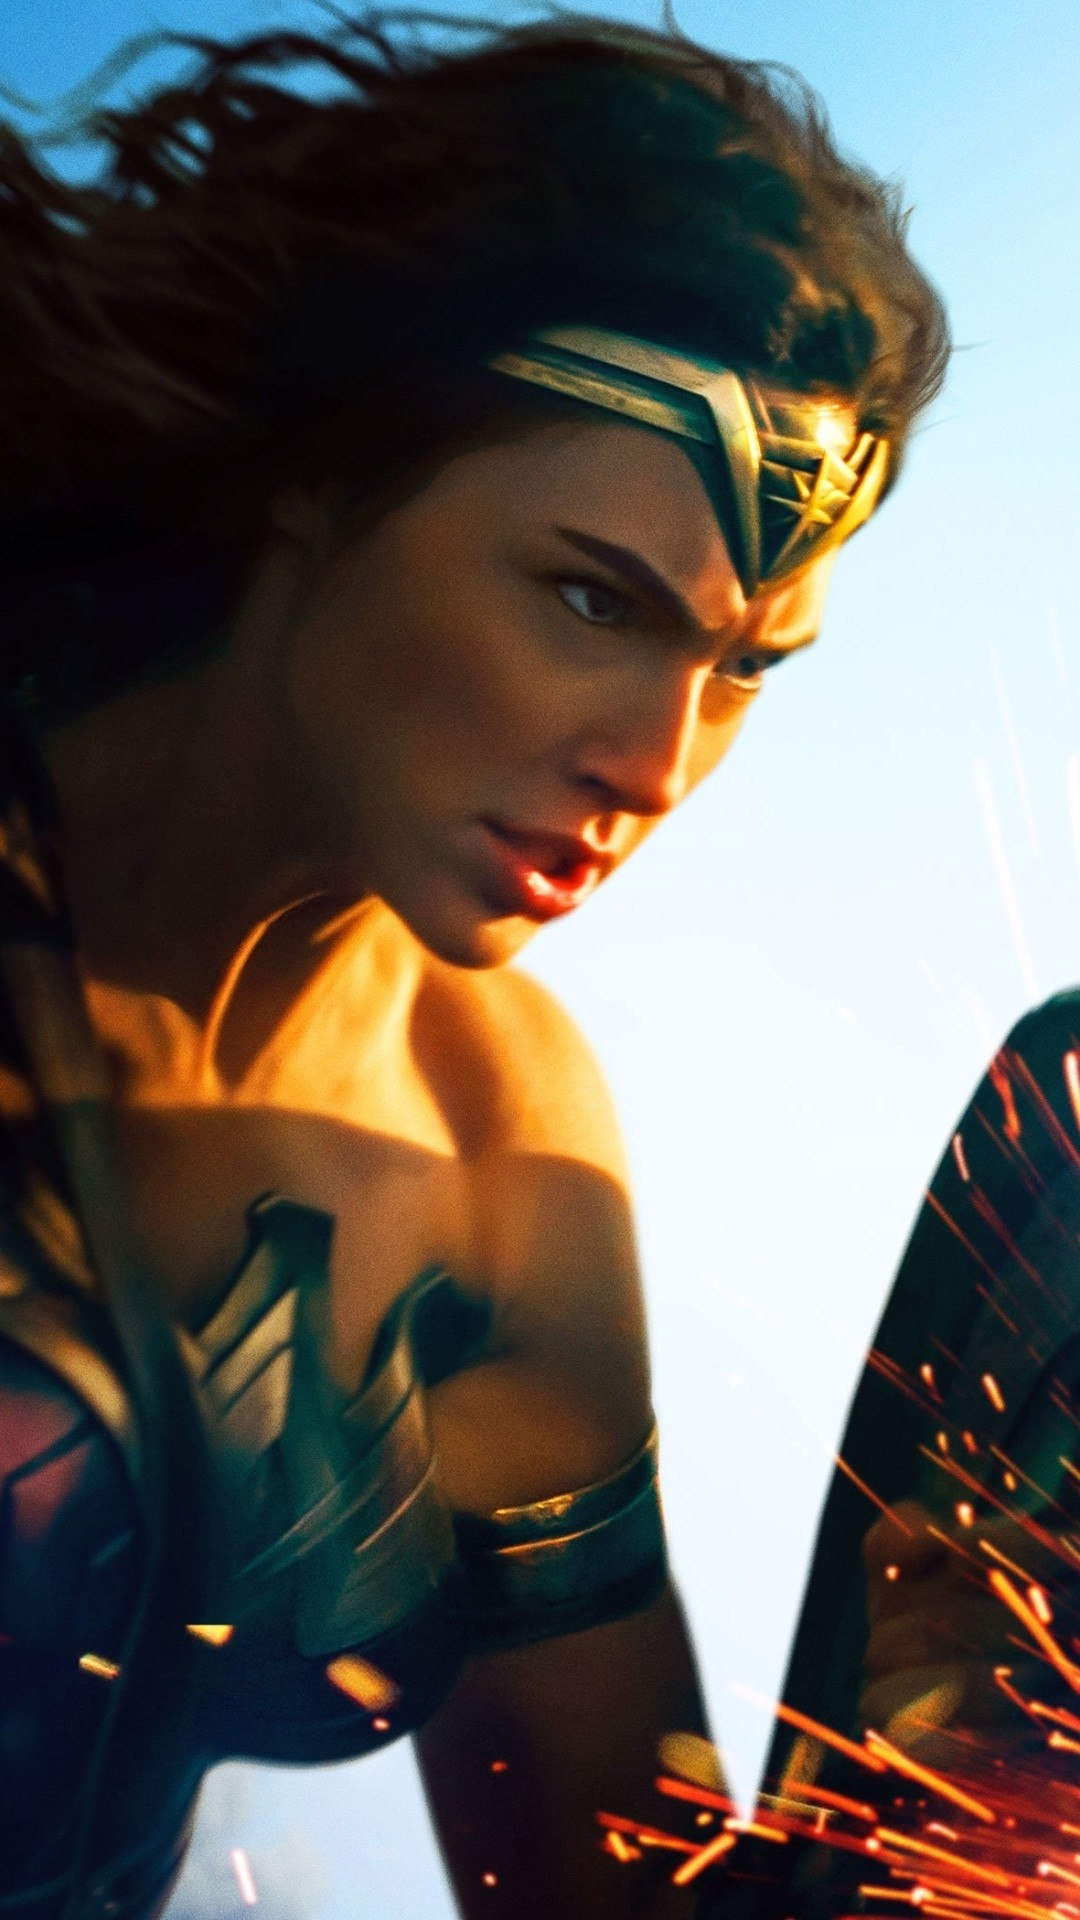 Wonder woman wallpapers 63 images - Wonder woman wallpaper ...